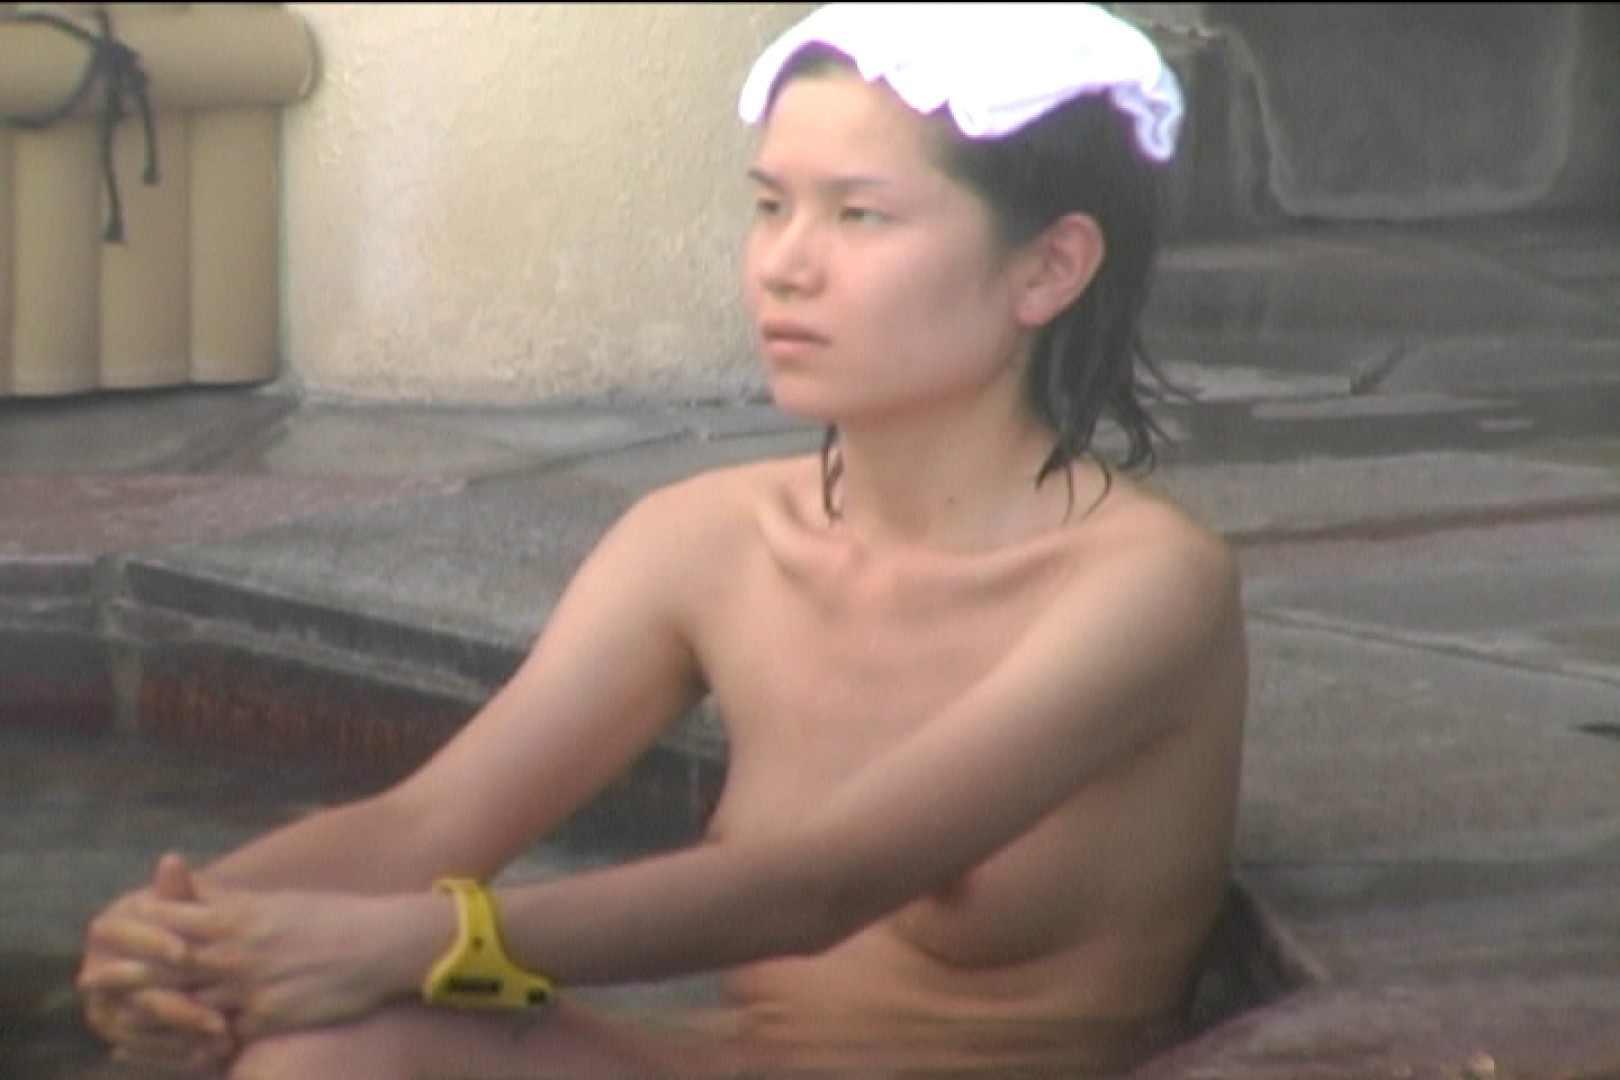 Aquaな露天風呂Vol.530 盗撮 | HなOL  88pic 86